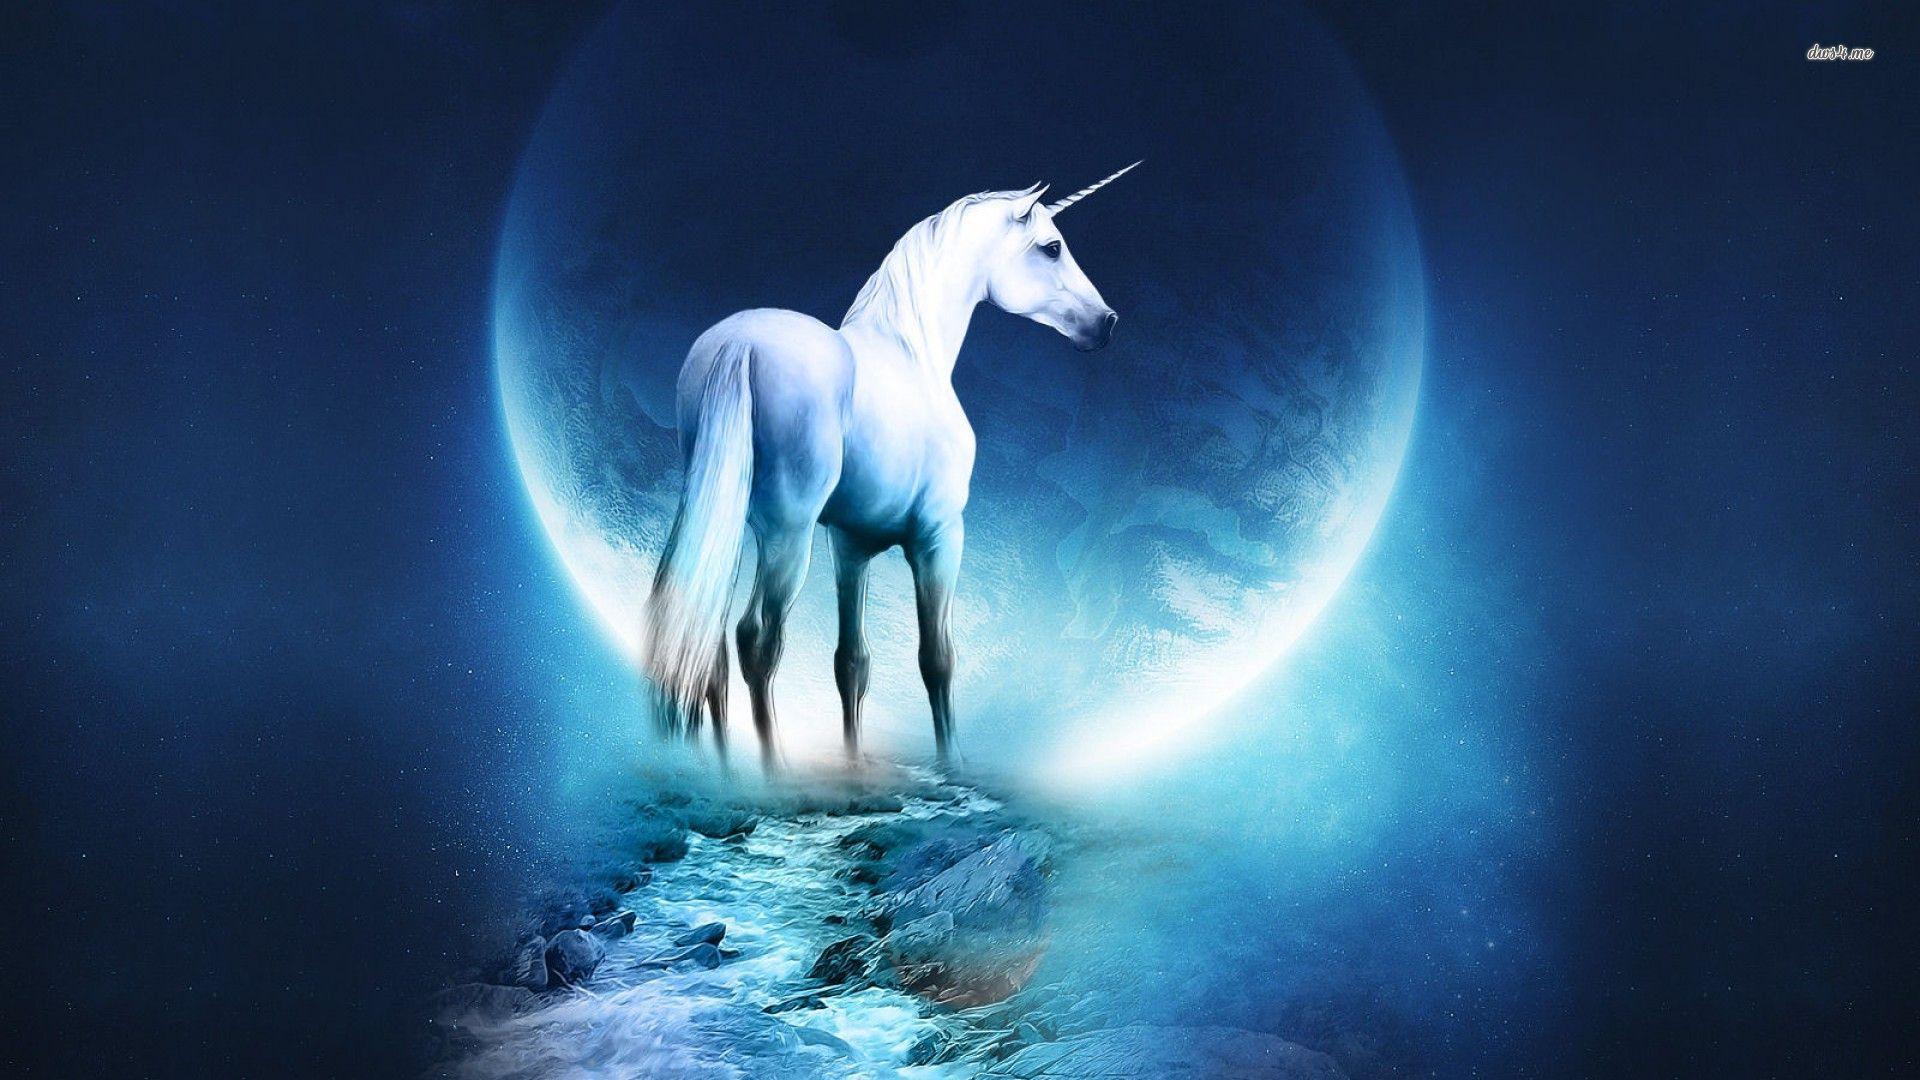 Hd wallpaper unicorn - Hd Wallpaper Unicorn Unicorn Wallpaper 1280x800 Unicorn Wallpaper 1366x768 Unicorn